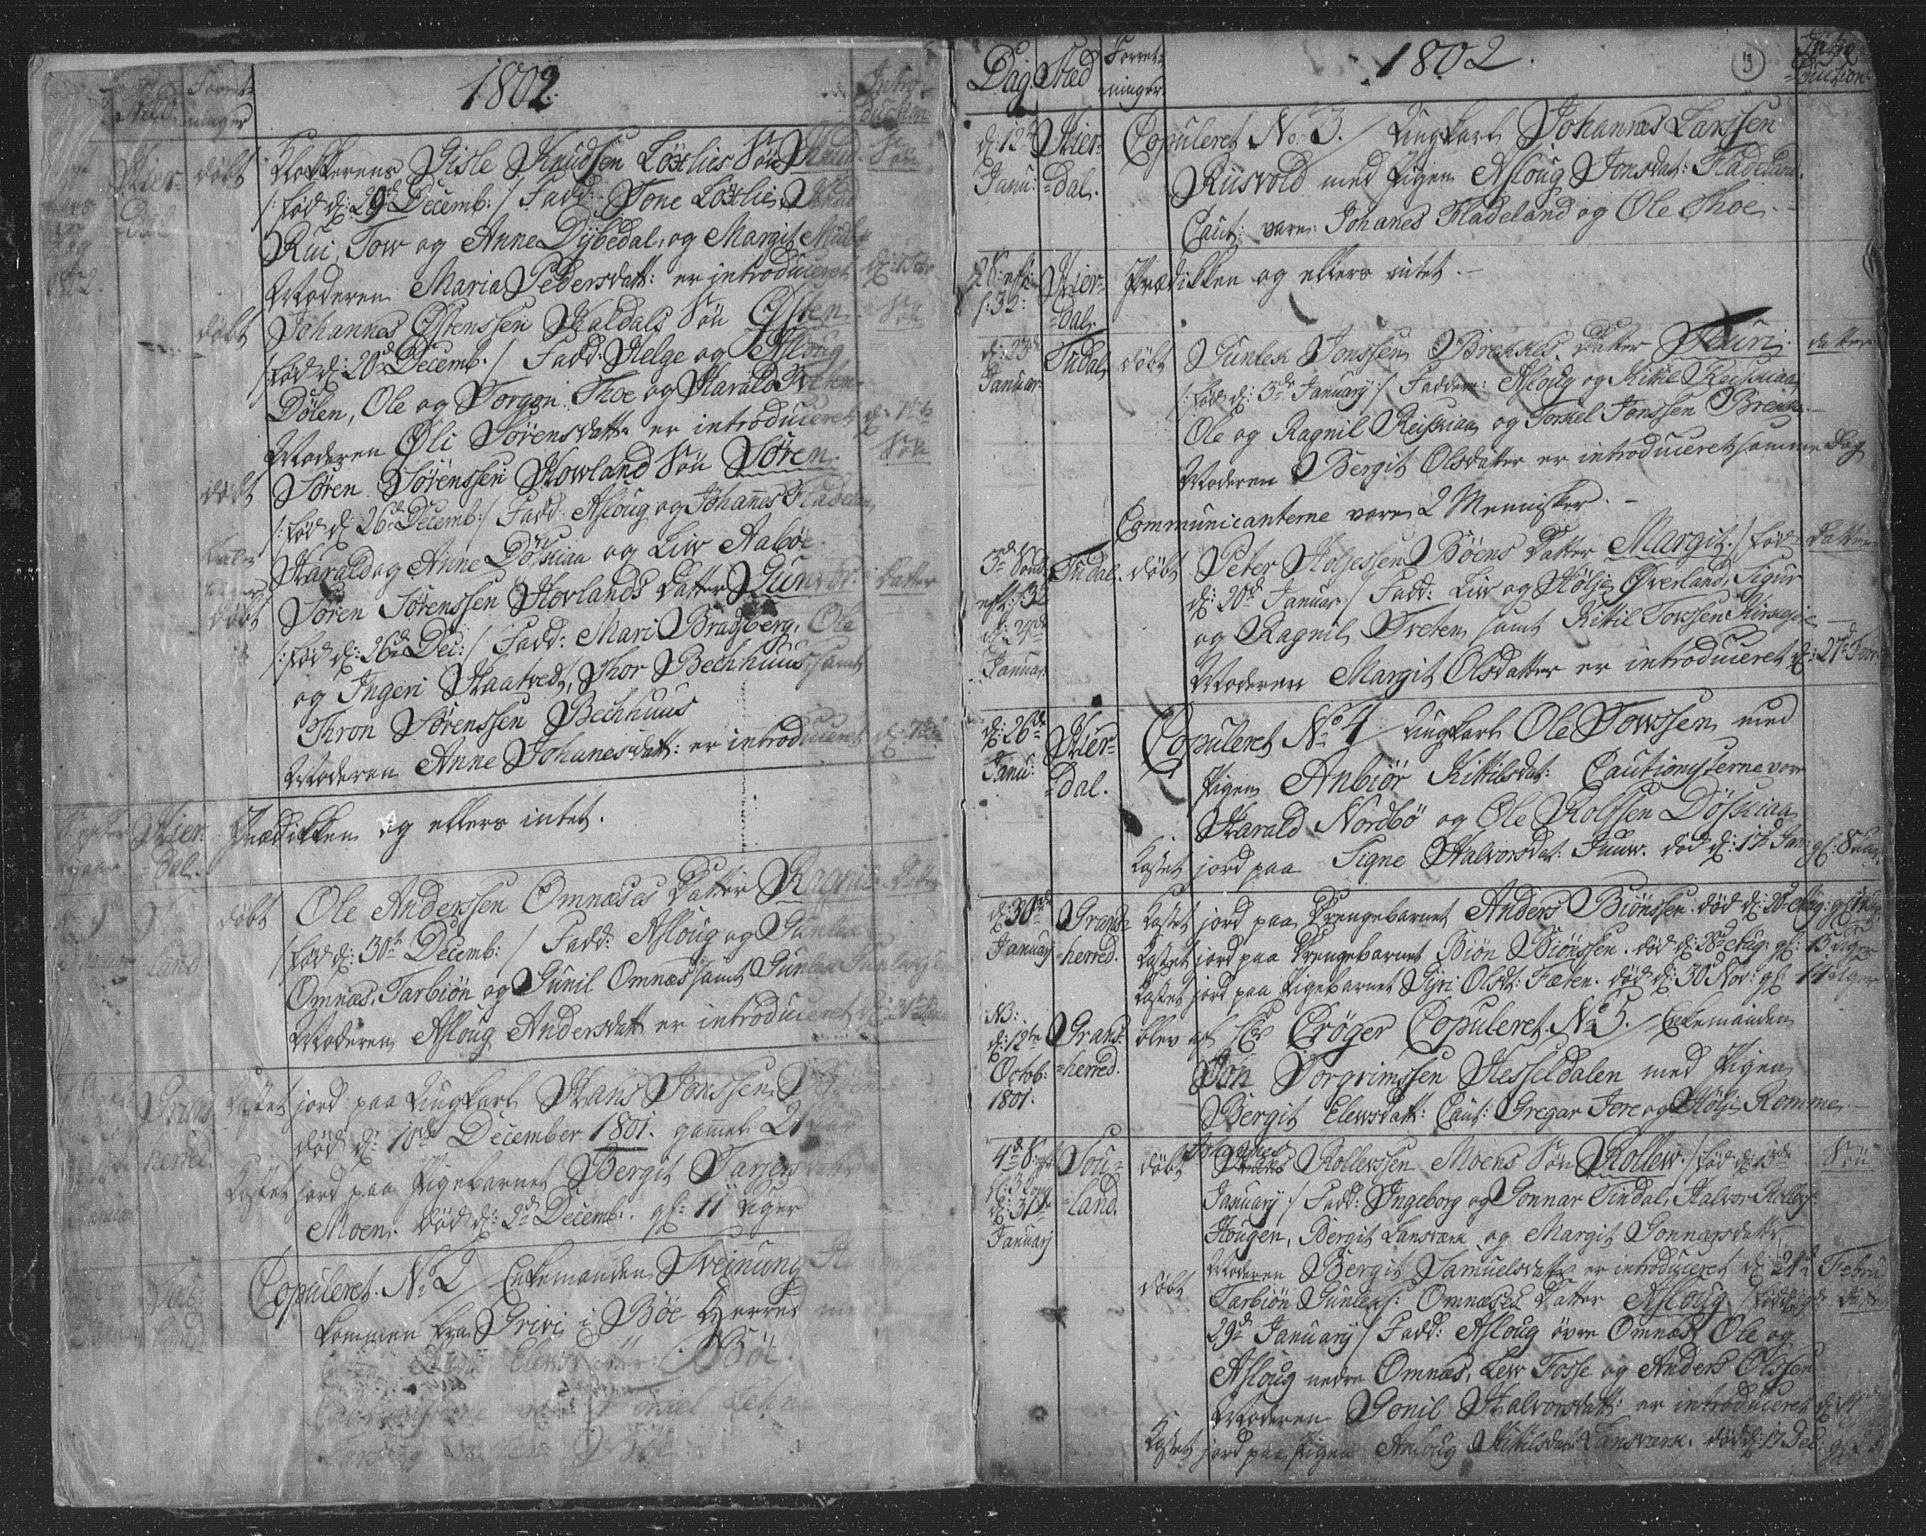 SAKO, Hjartdal kirkebøker, F/Fa/L0006: Ministerialbok nr. I 6, 1801-1814, s. 3